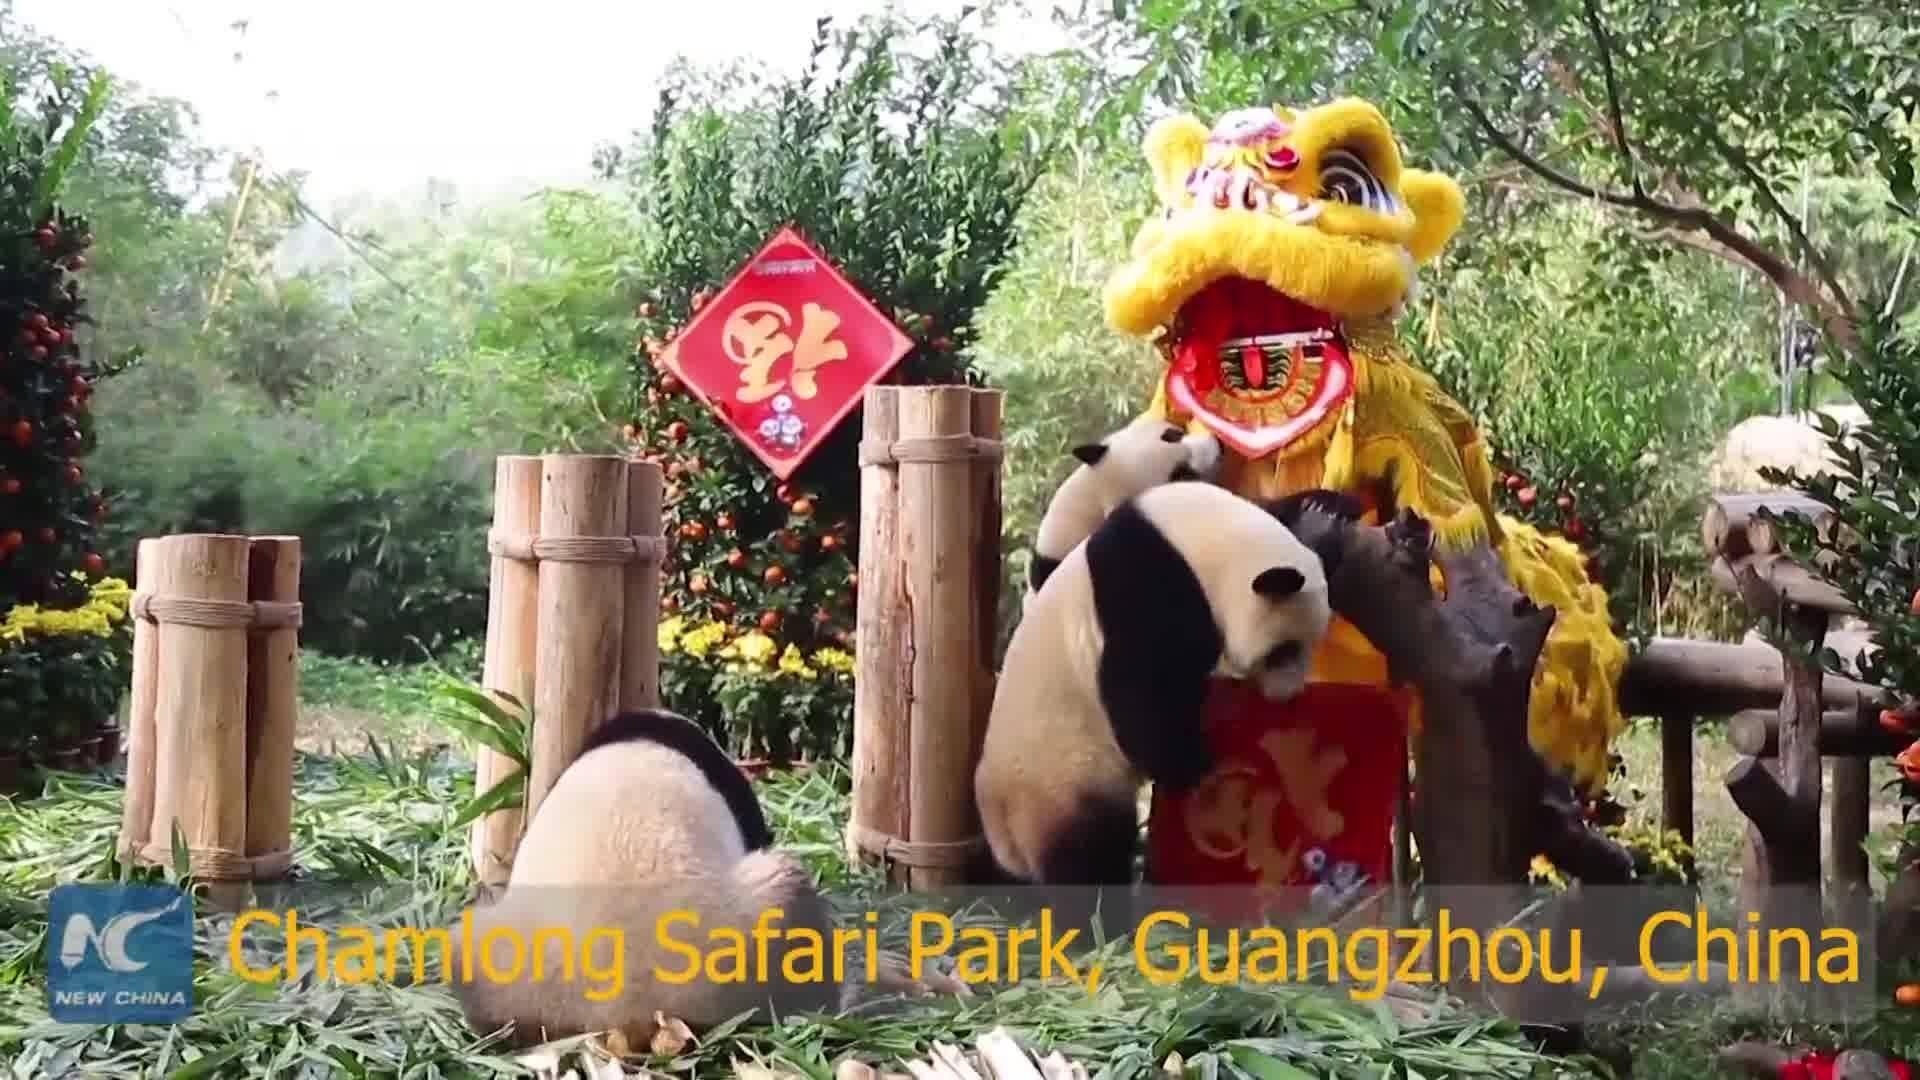 Cute giant pandas from around the world extend chinese new year giant pandas from around the world extend chinese new year greetings in different ways kristyandbryce Gallery